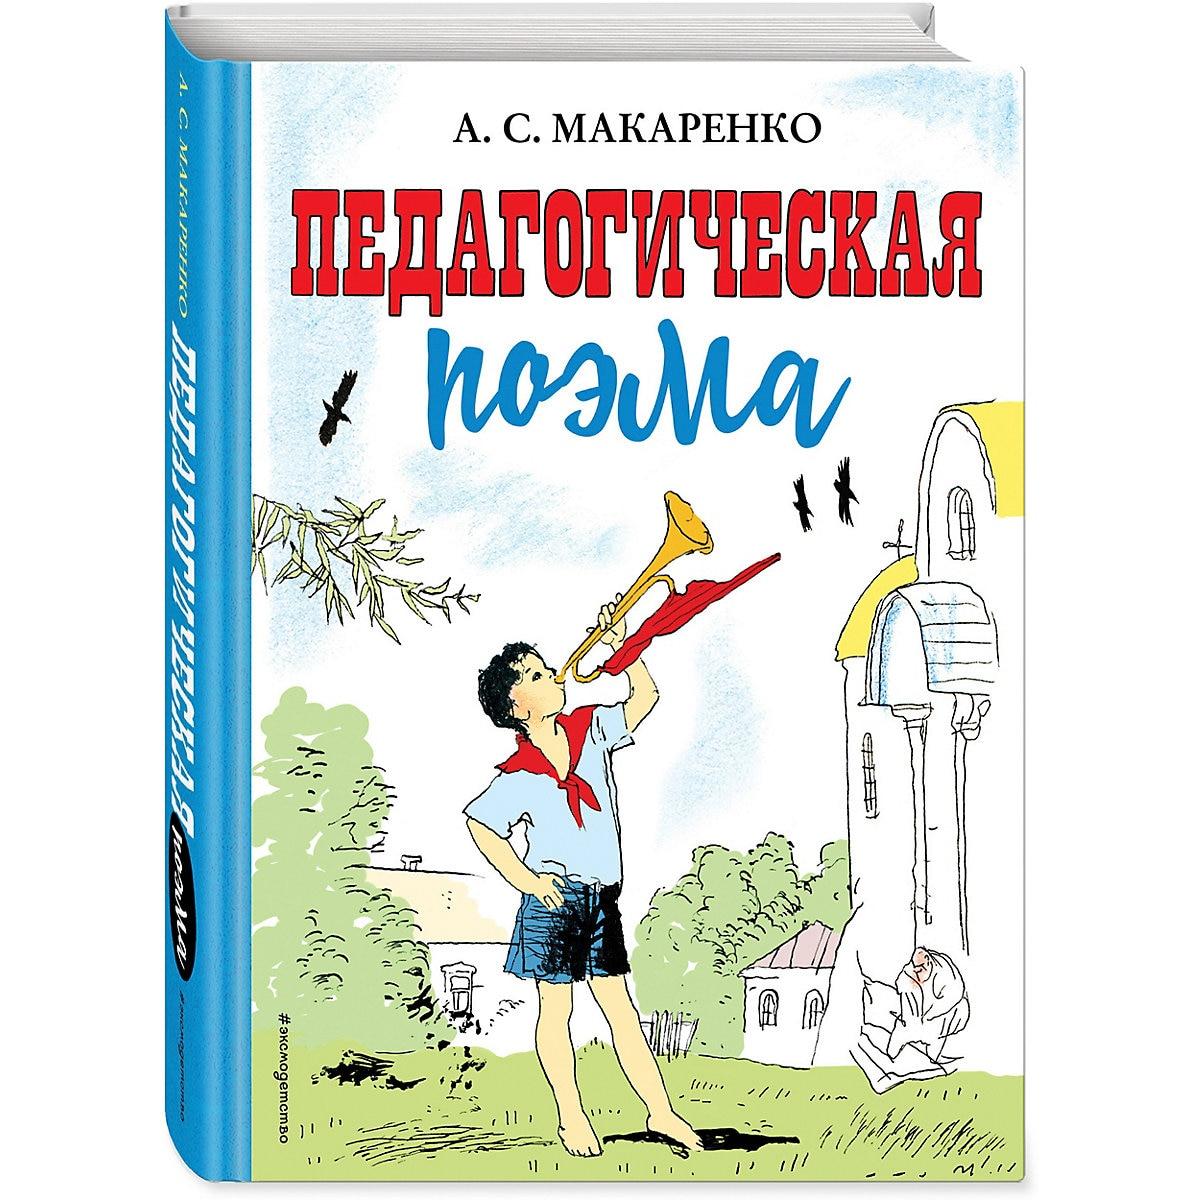 Books EKSMO 10296544 Children Education Encyclopedia Alphabet Dictionary Book For Baby MTpromo